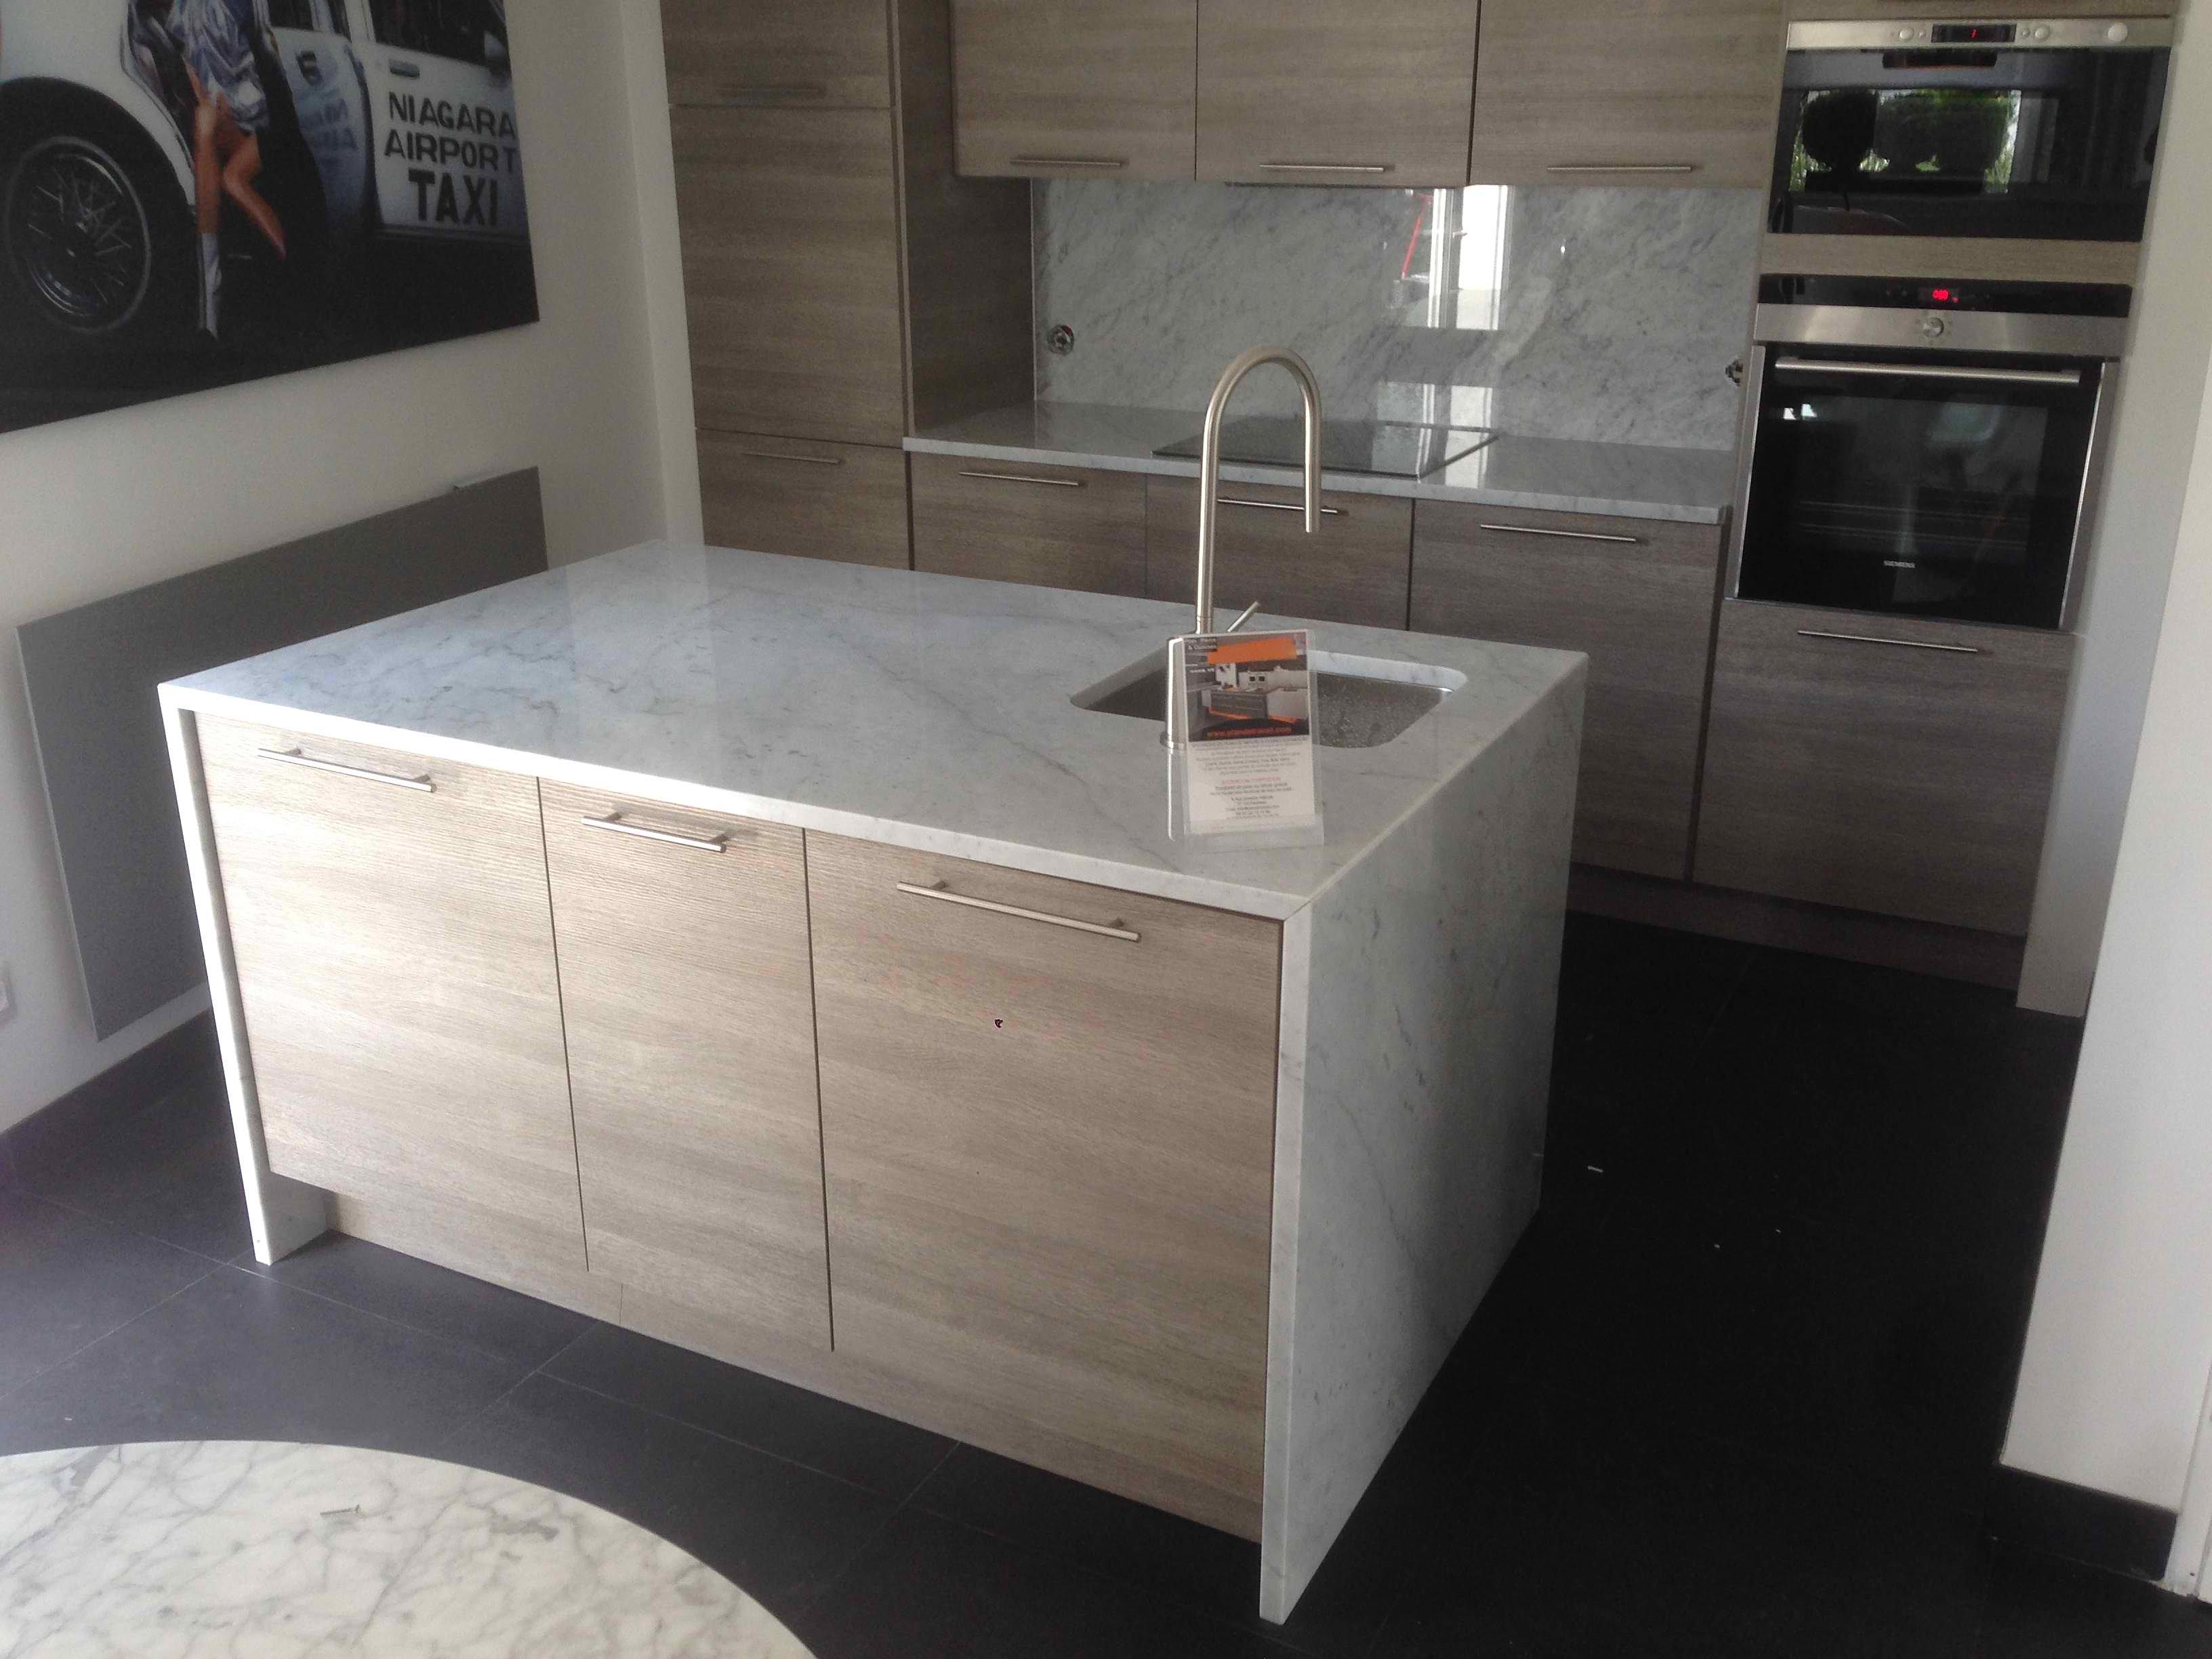 devis plan de travail com paris granit quartz marbre ilot cuisine marbre carrare. Black Bedroom Furniture Sets. Home Design Ideas